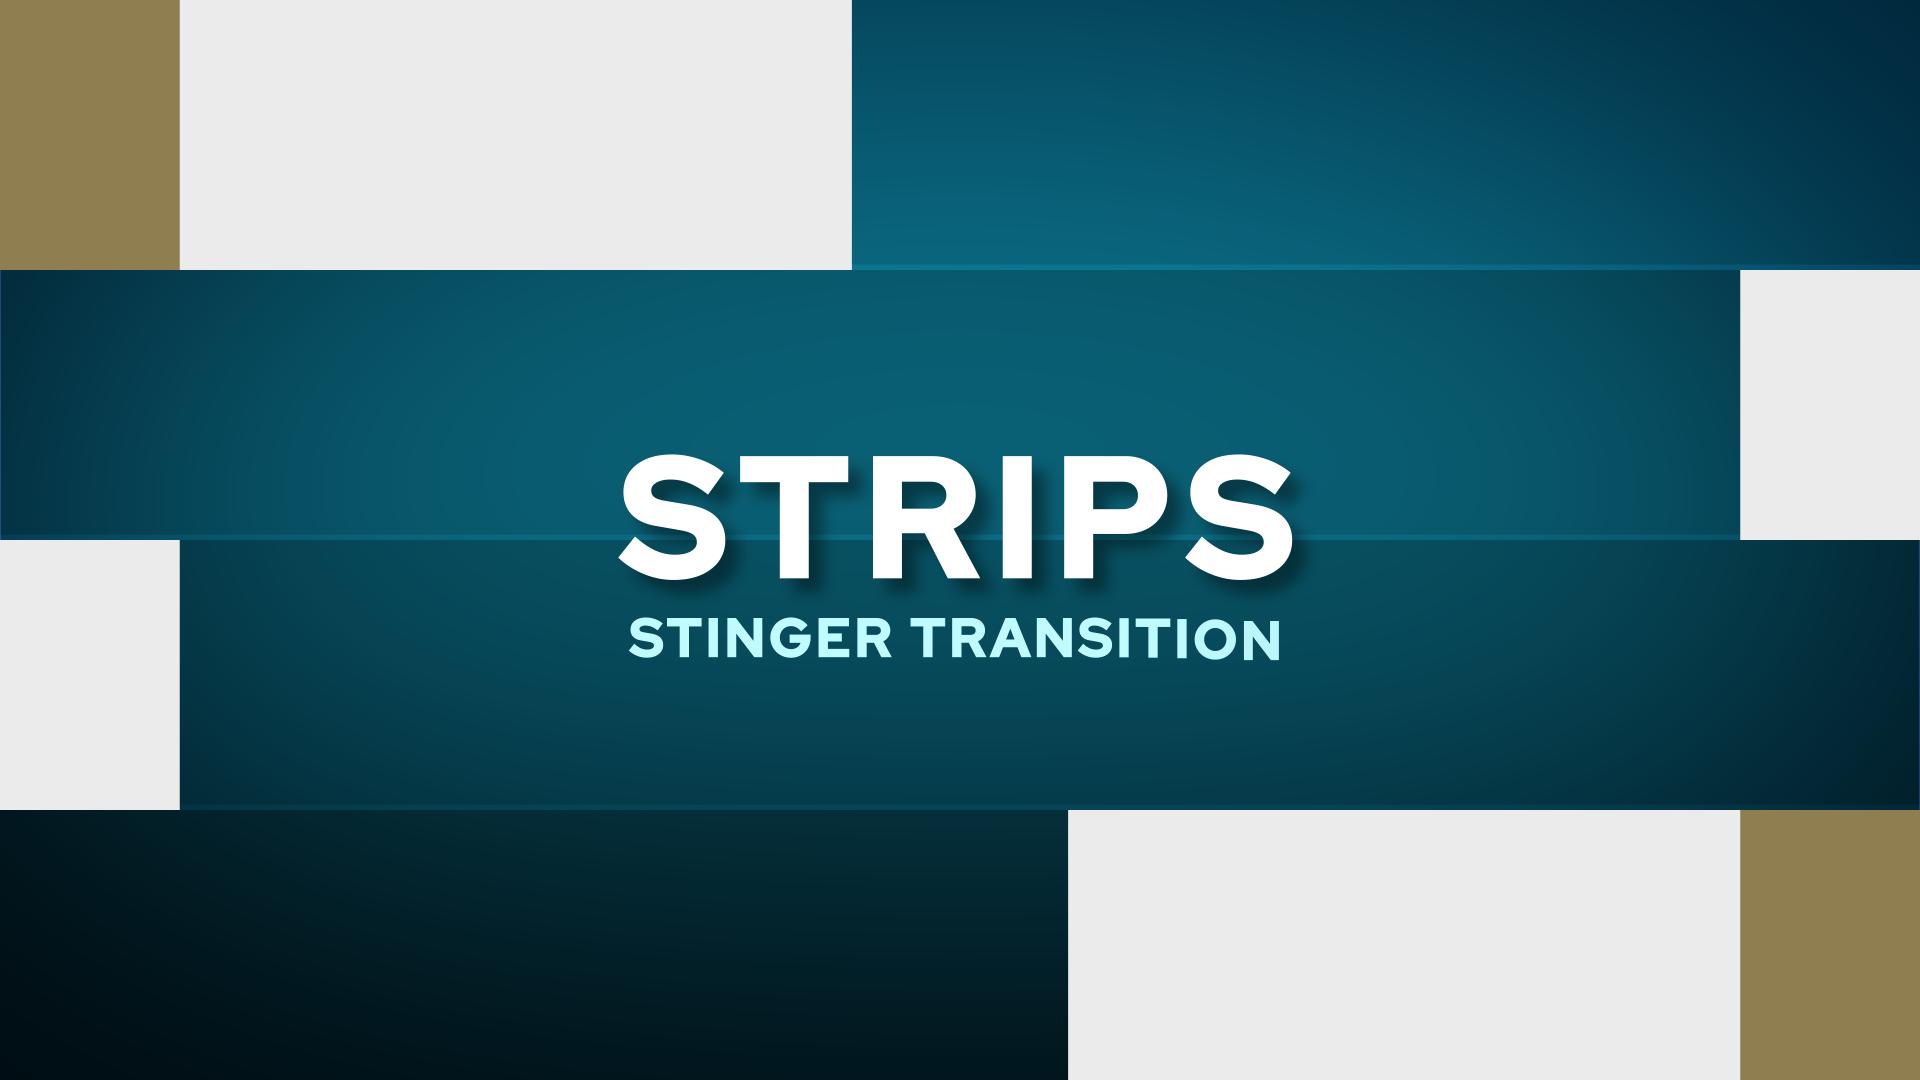 Strips Stinger Transition